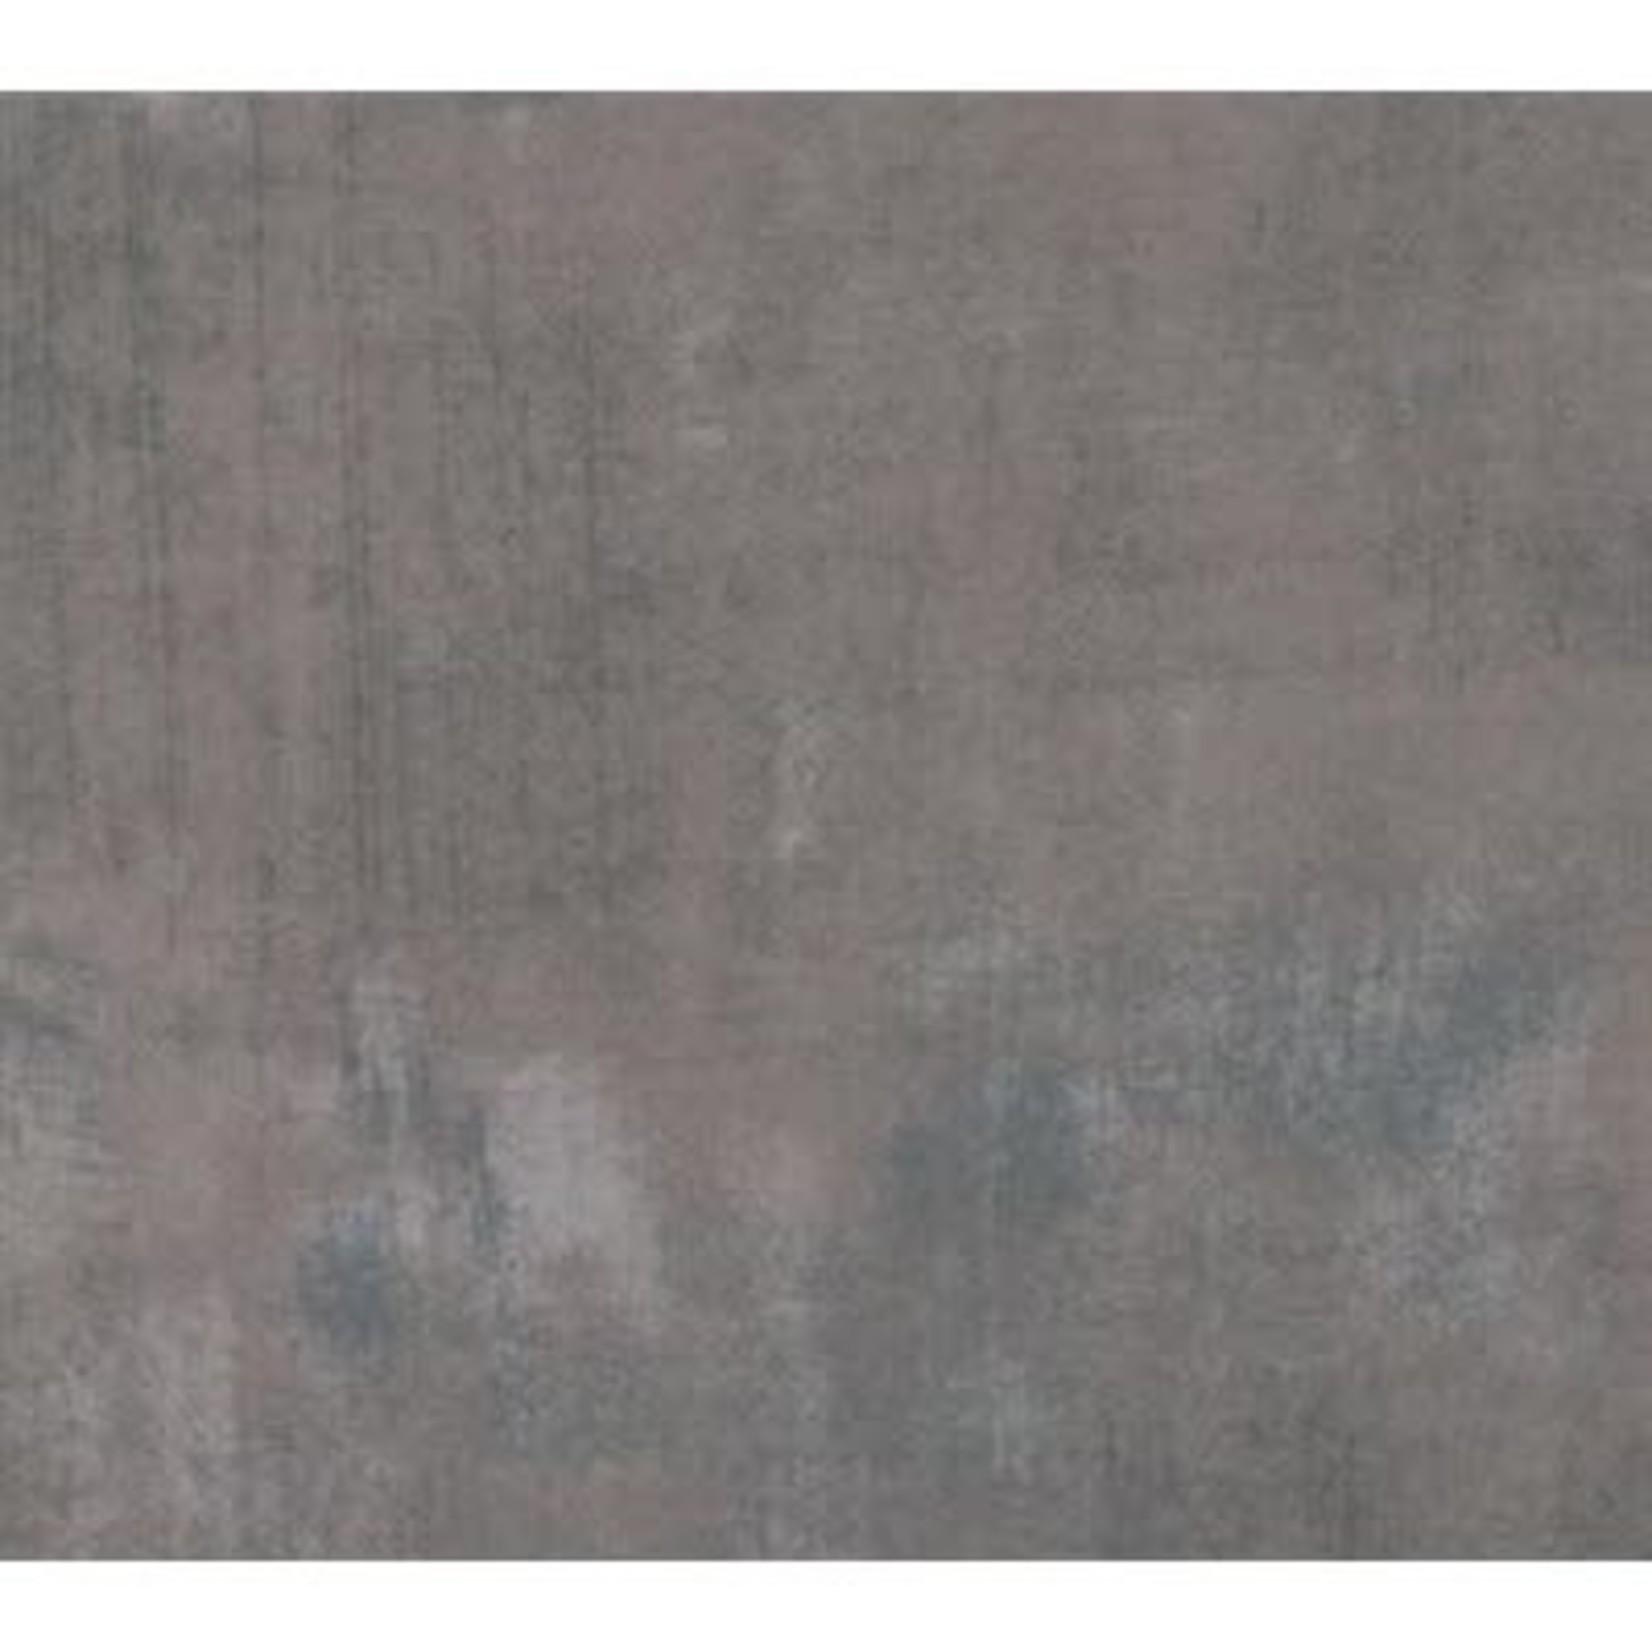 Moda Grunge Basics Grunge - Primer per cm or $20/m